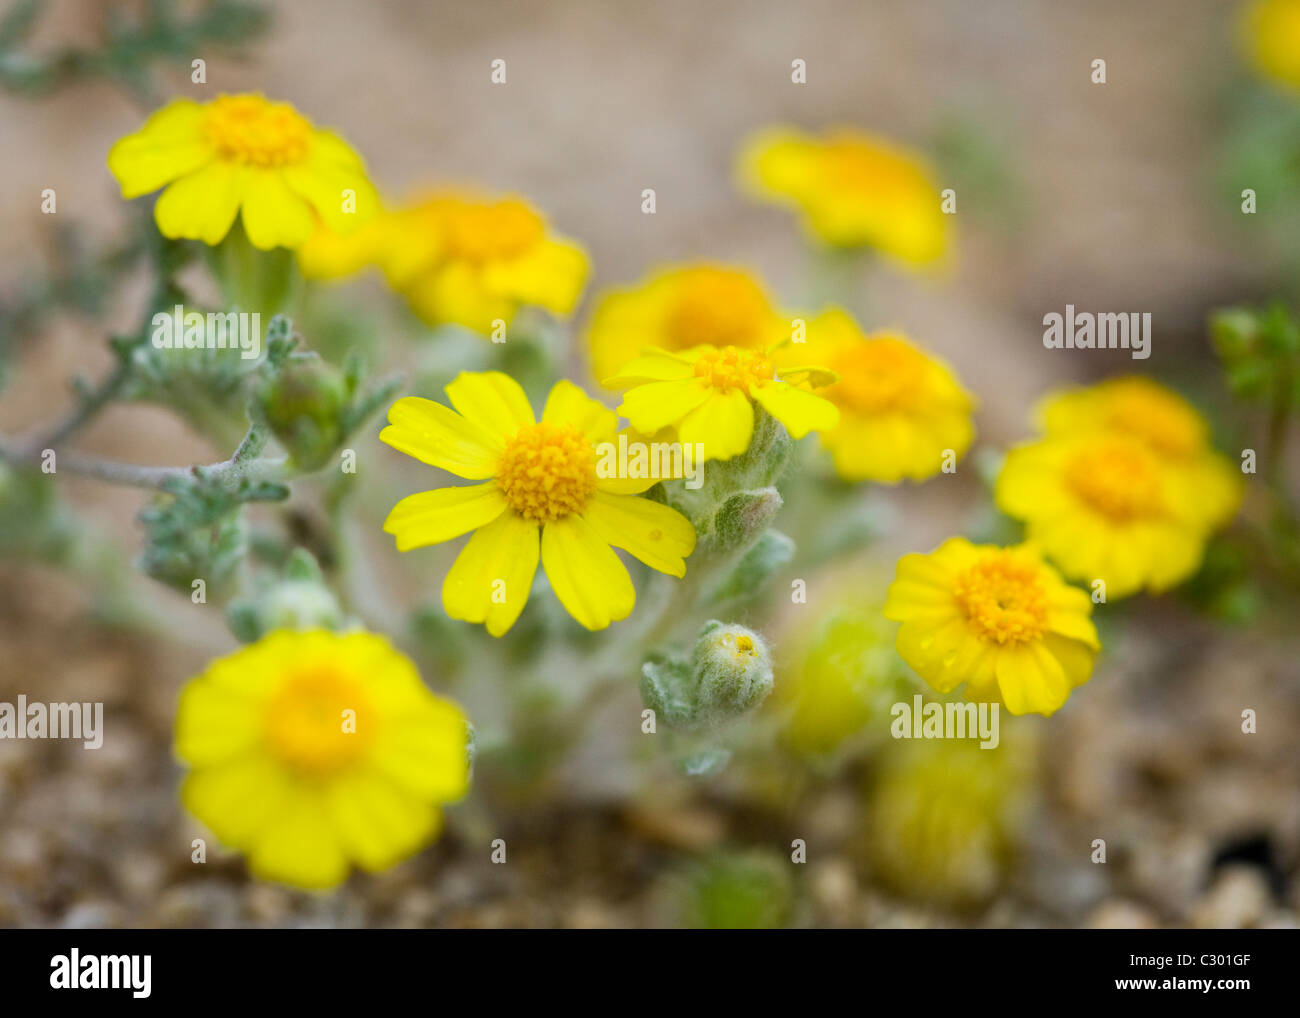 North American desert spring wildflowers California tickseed (Coreopsis californica) - Mojave desert, California - Stock Image